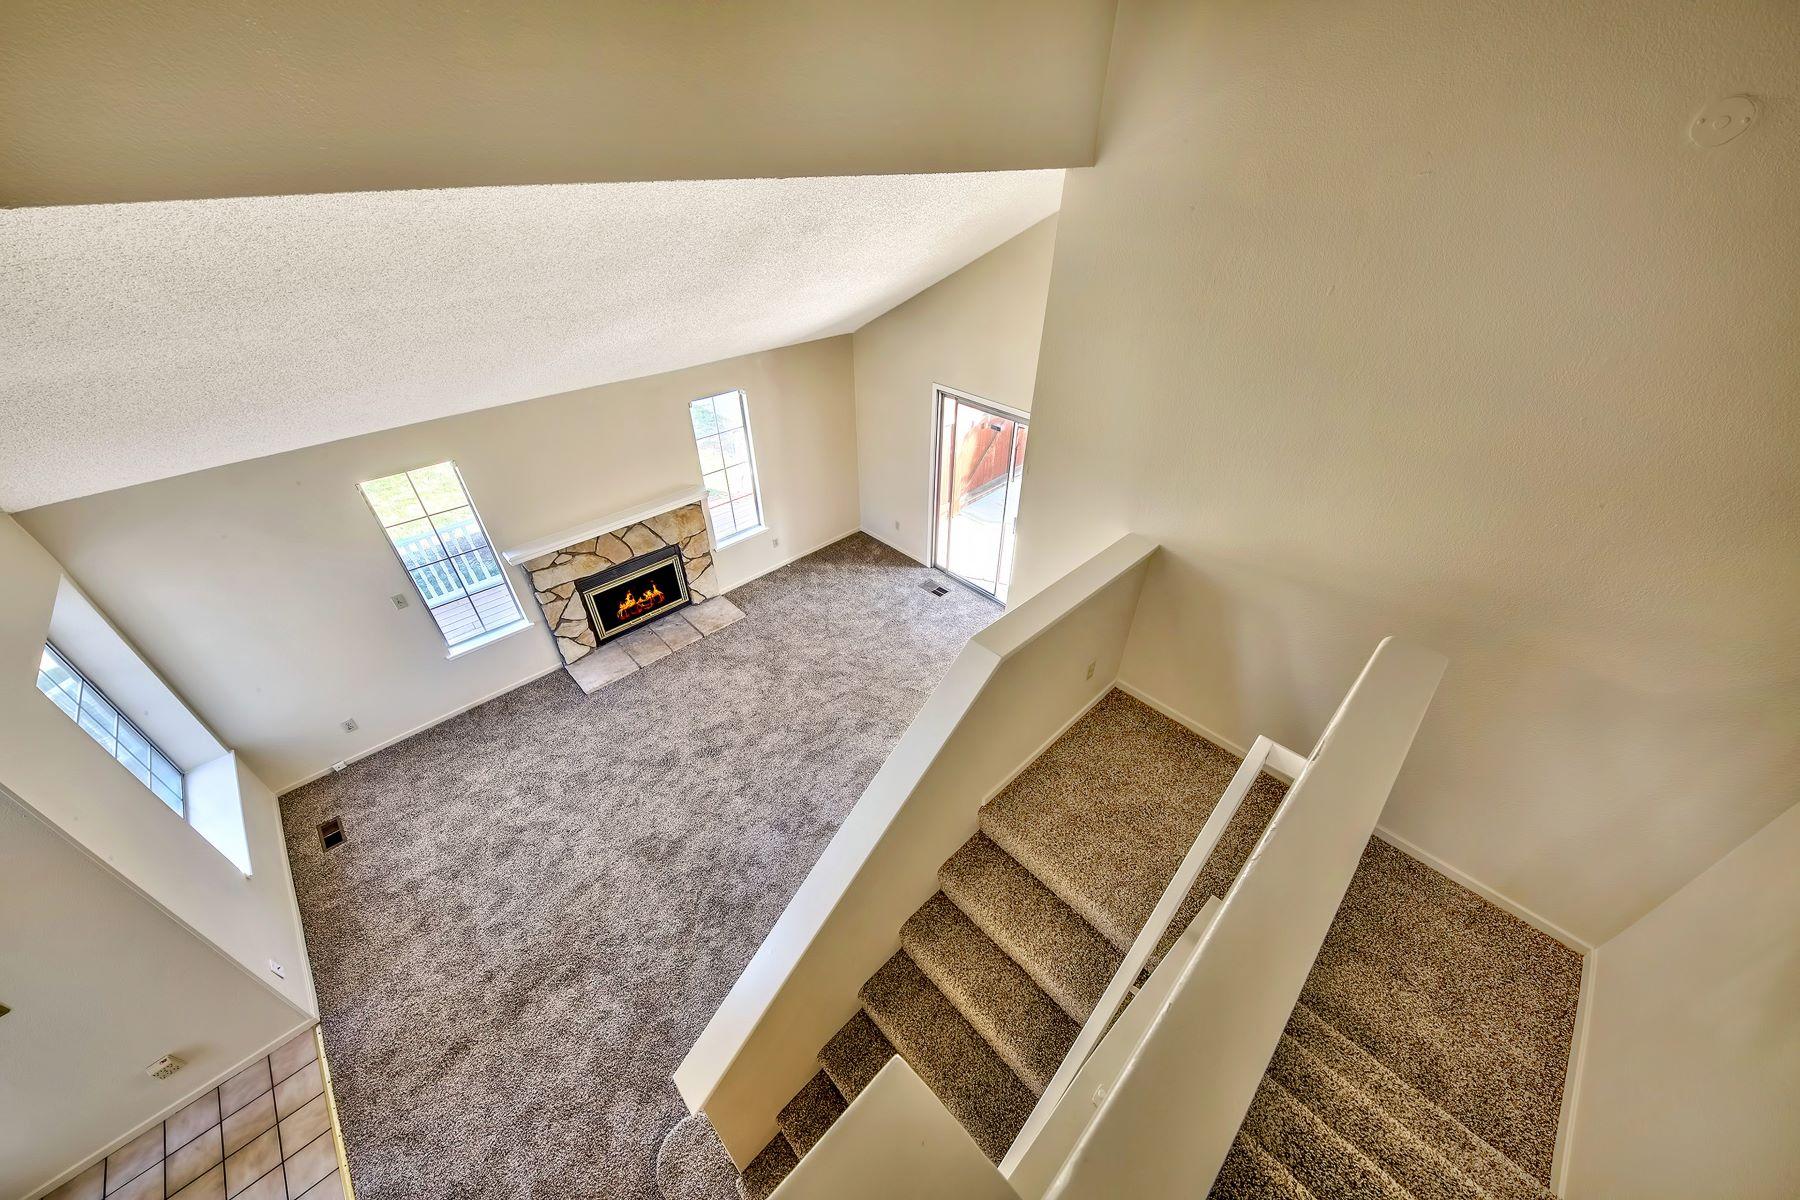 Additional photo for property listing at 2702 Caballo, Reno, Nevada 2702 Caballo Drive Reno, Nevada 89502 United States